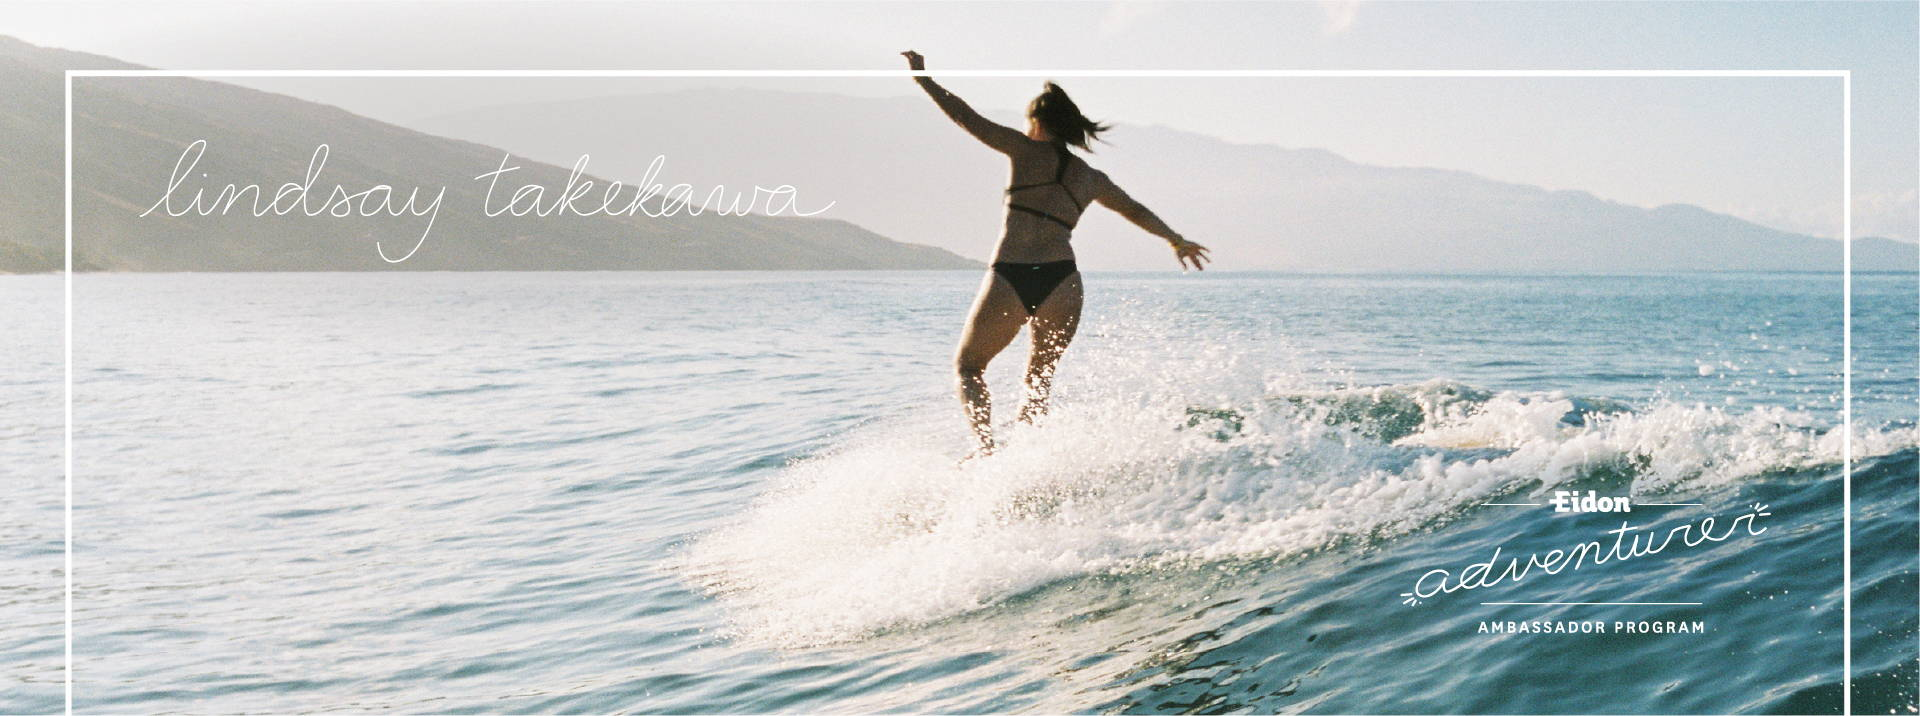 Introducing #EidonAdventurer Lindsay Takekawa